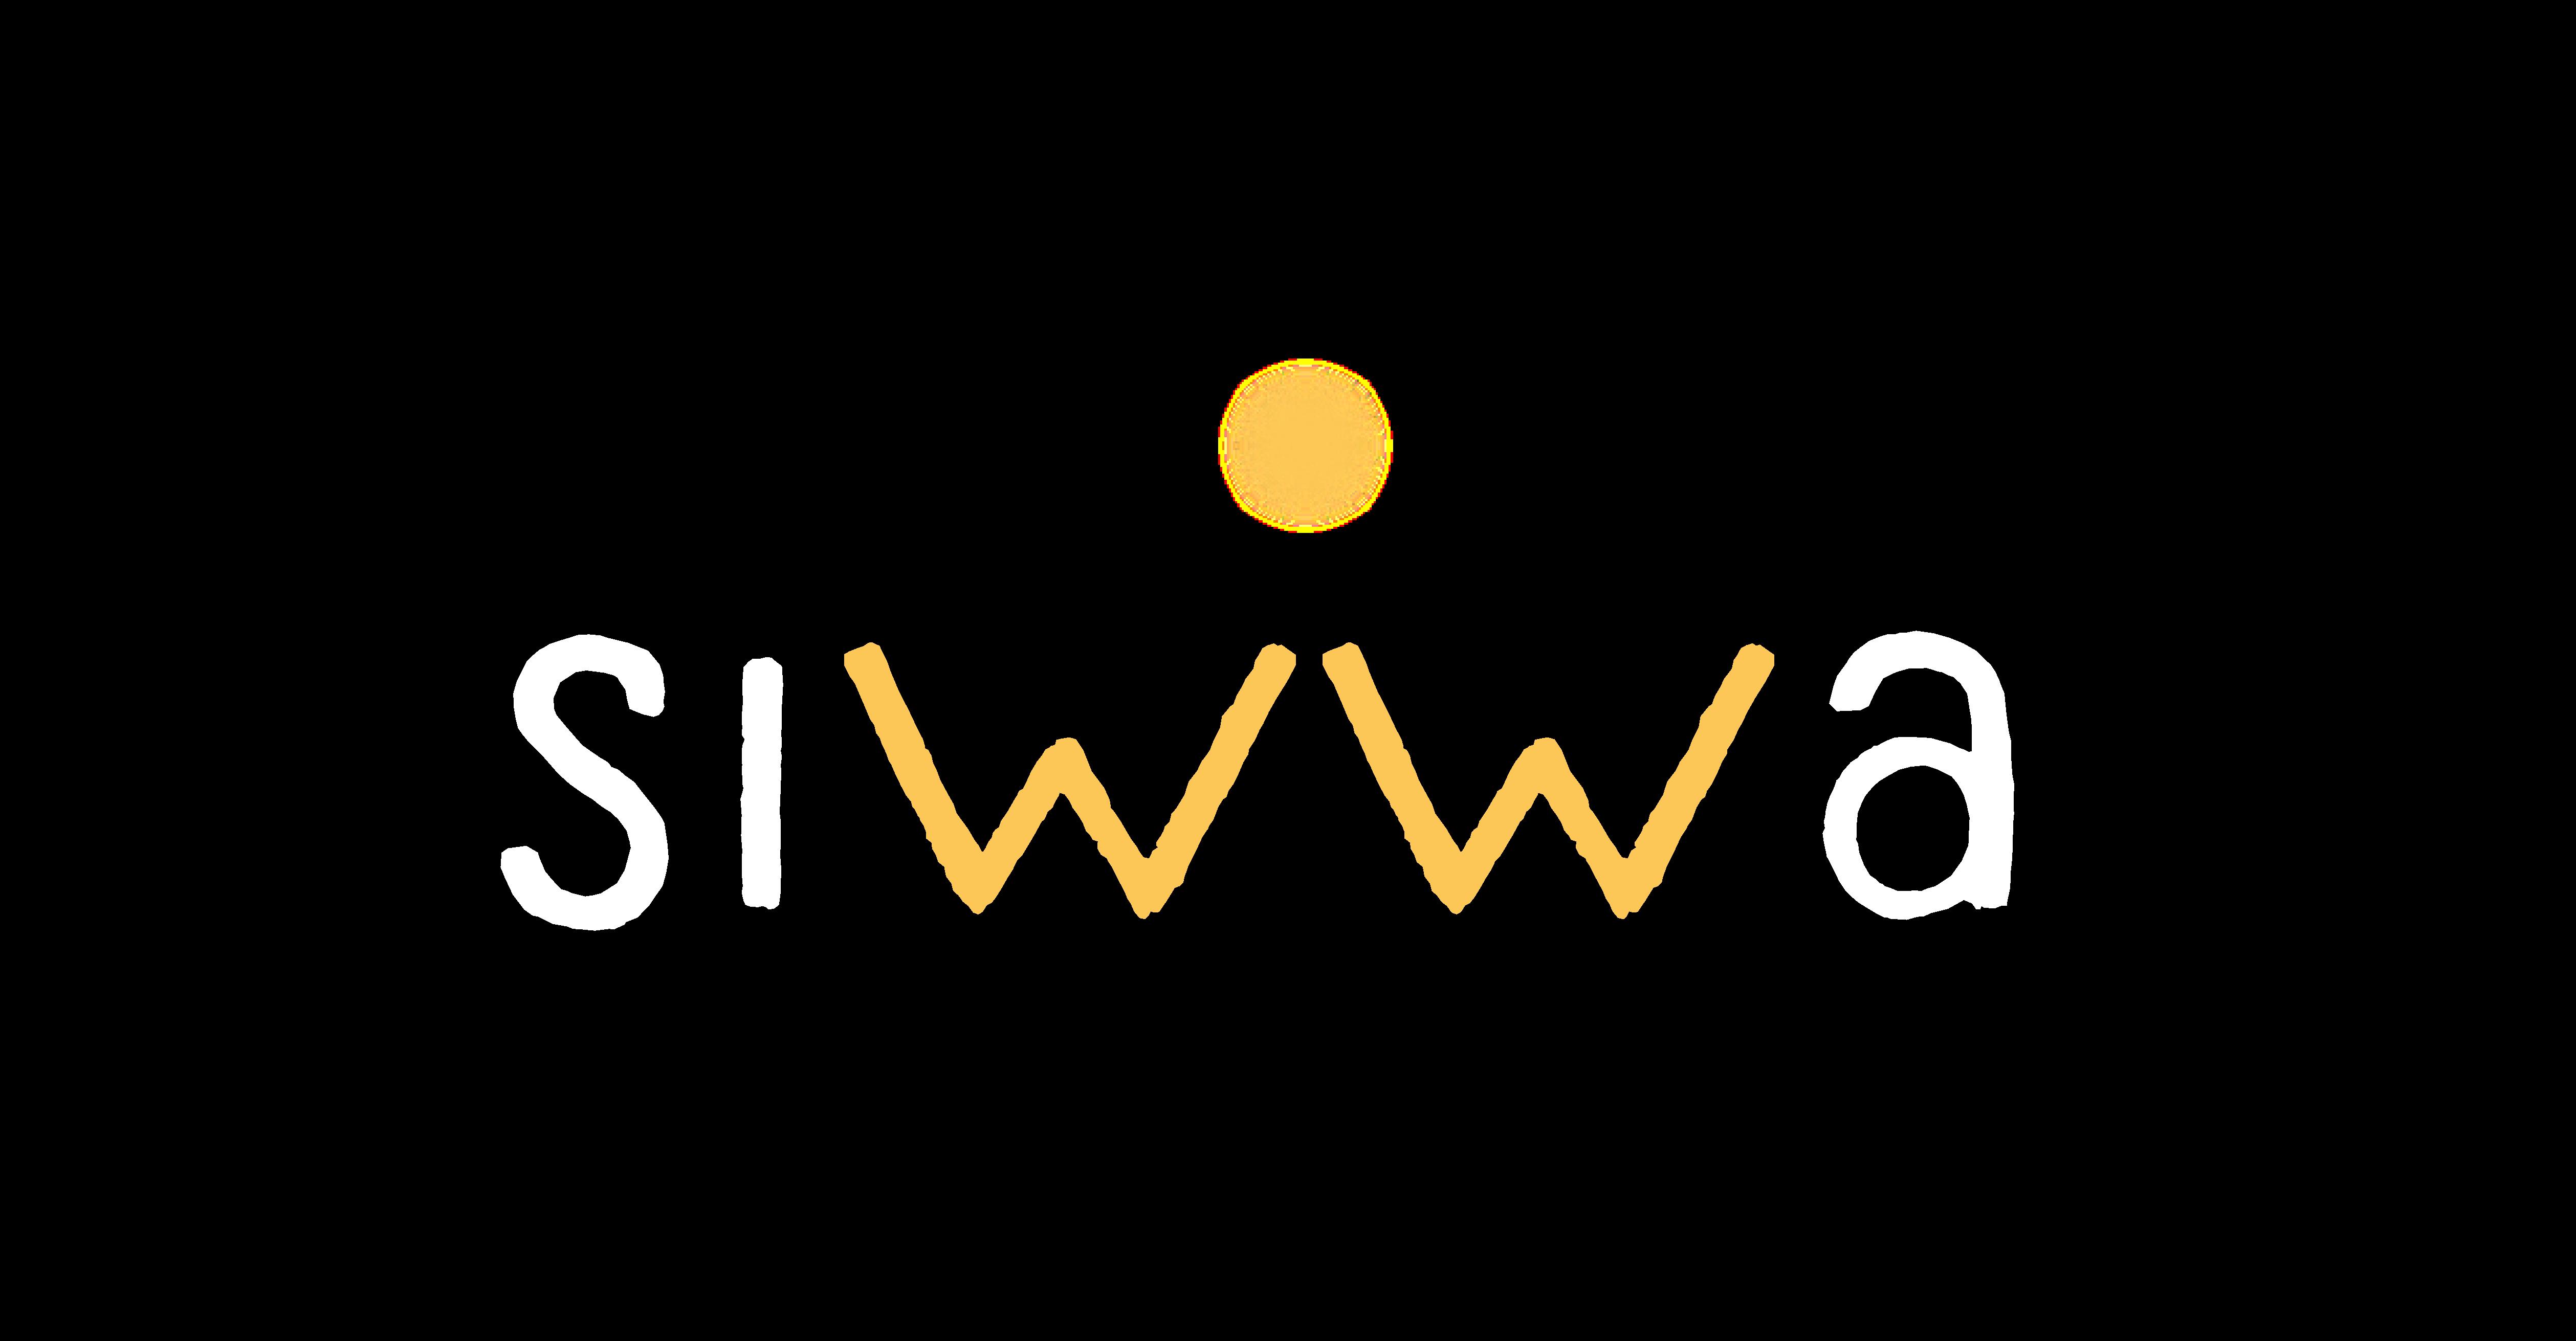 Siwwa